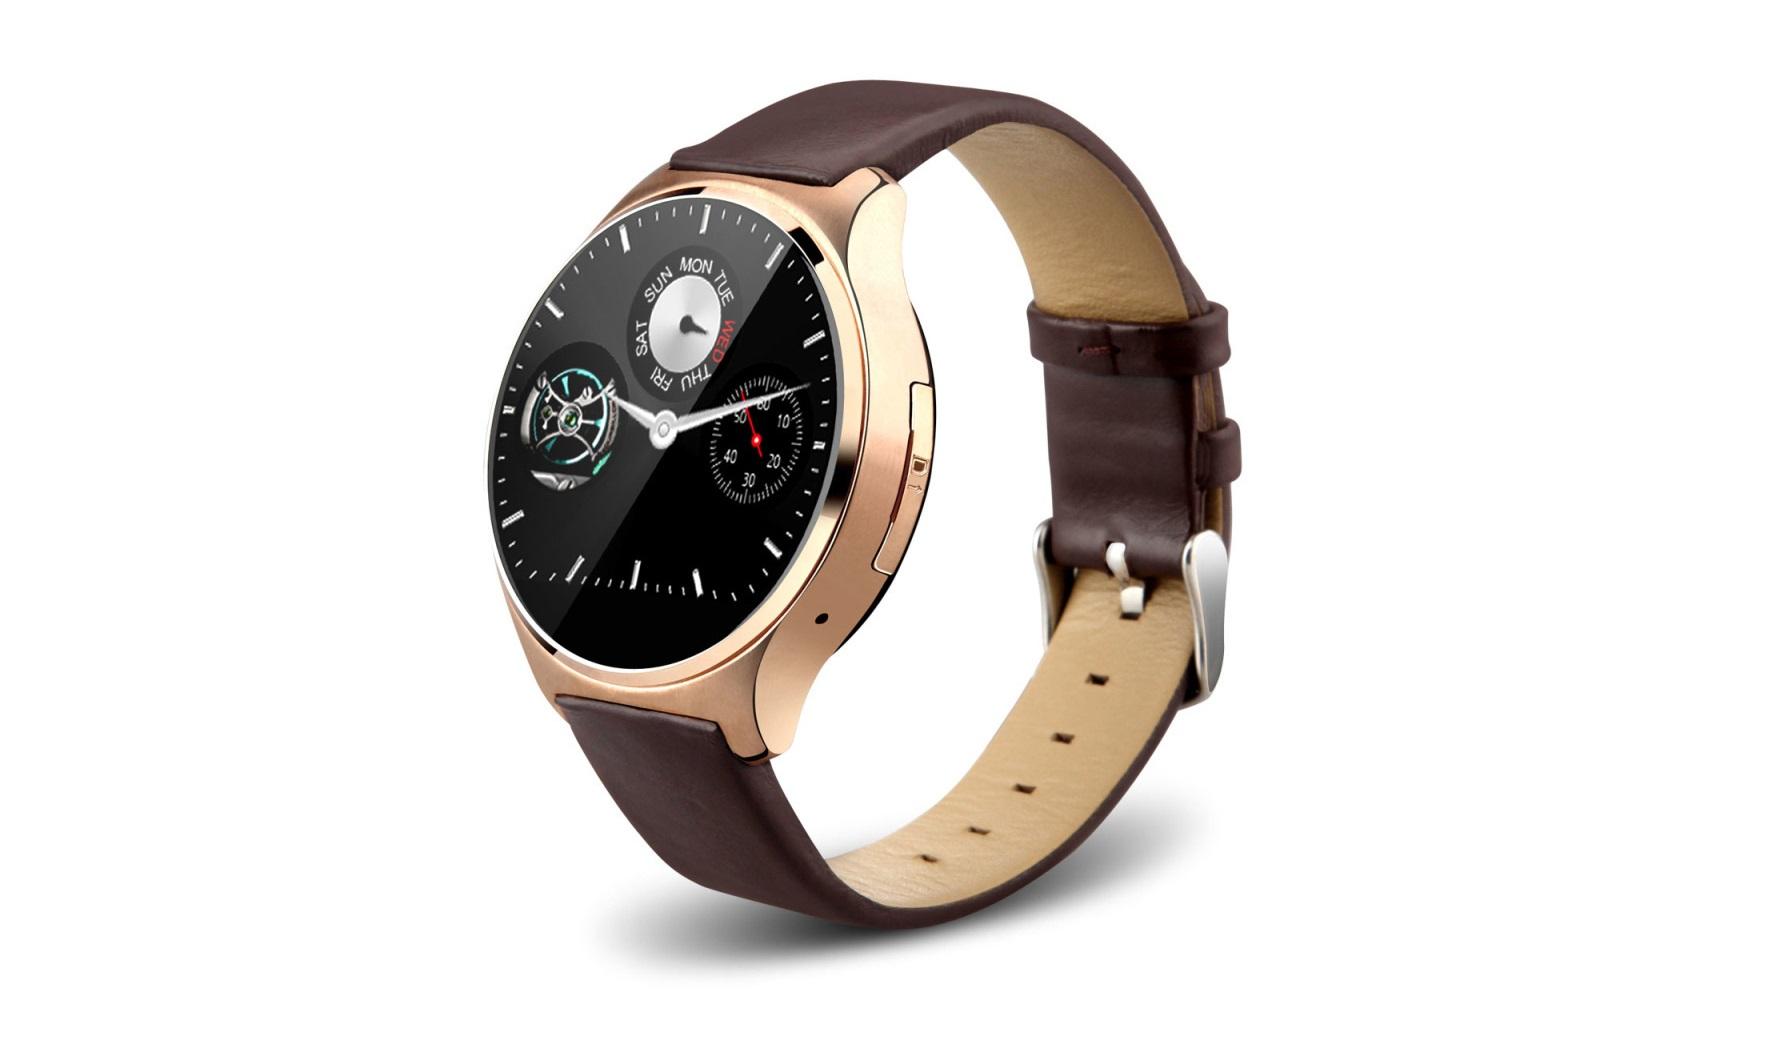 Kulaté chytré hodinky Oukitel A29 nyní v akci [sponzorovaný článek]